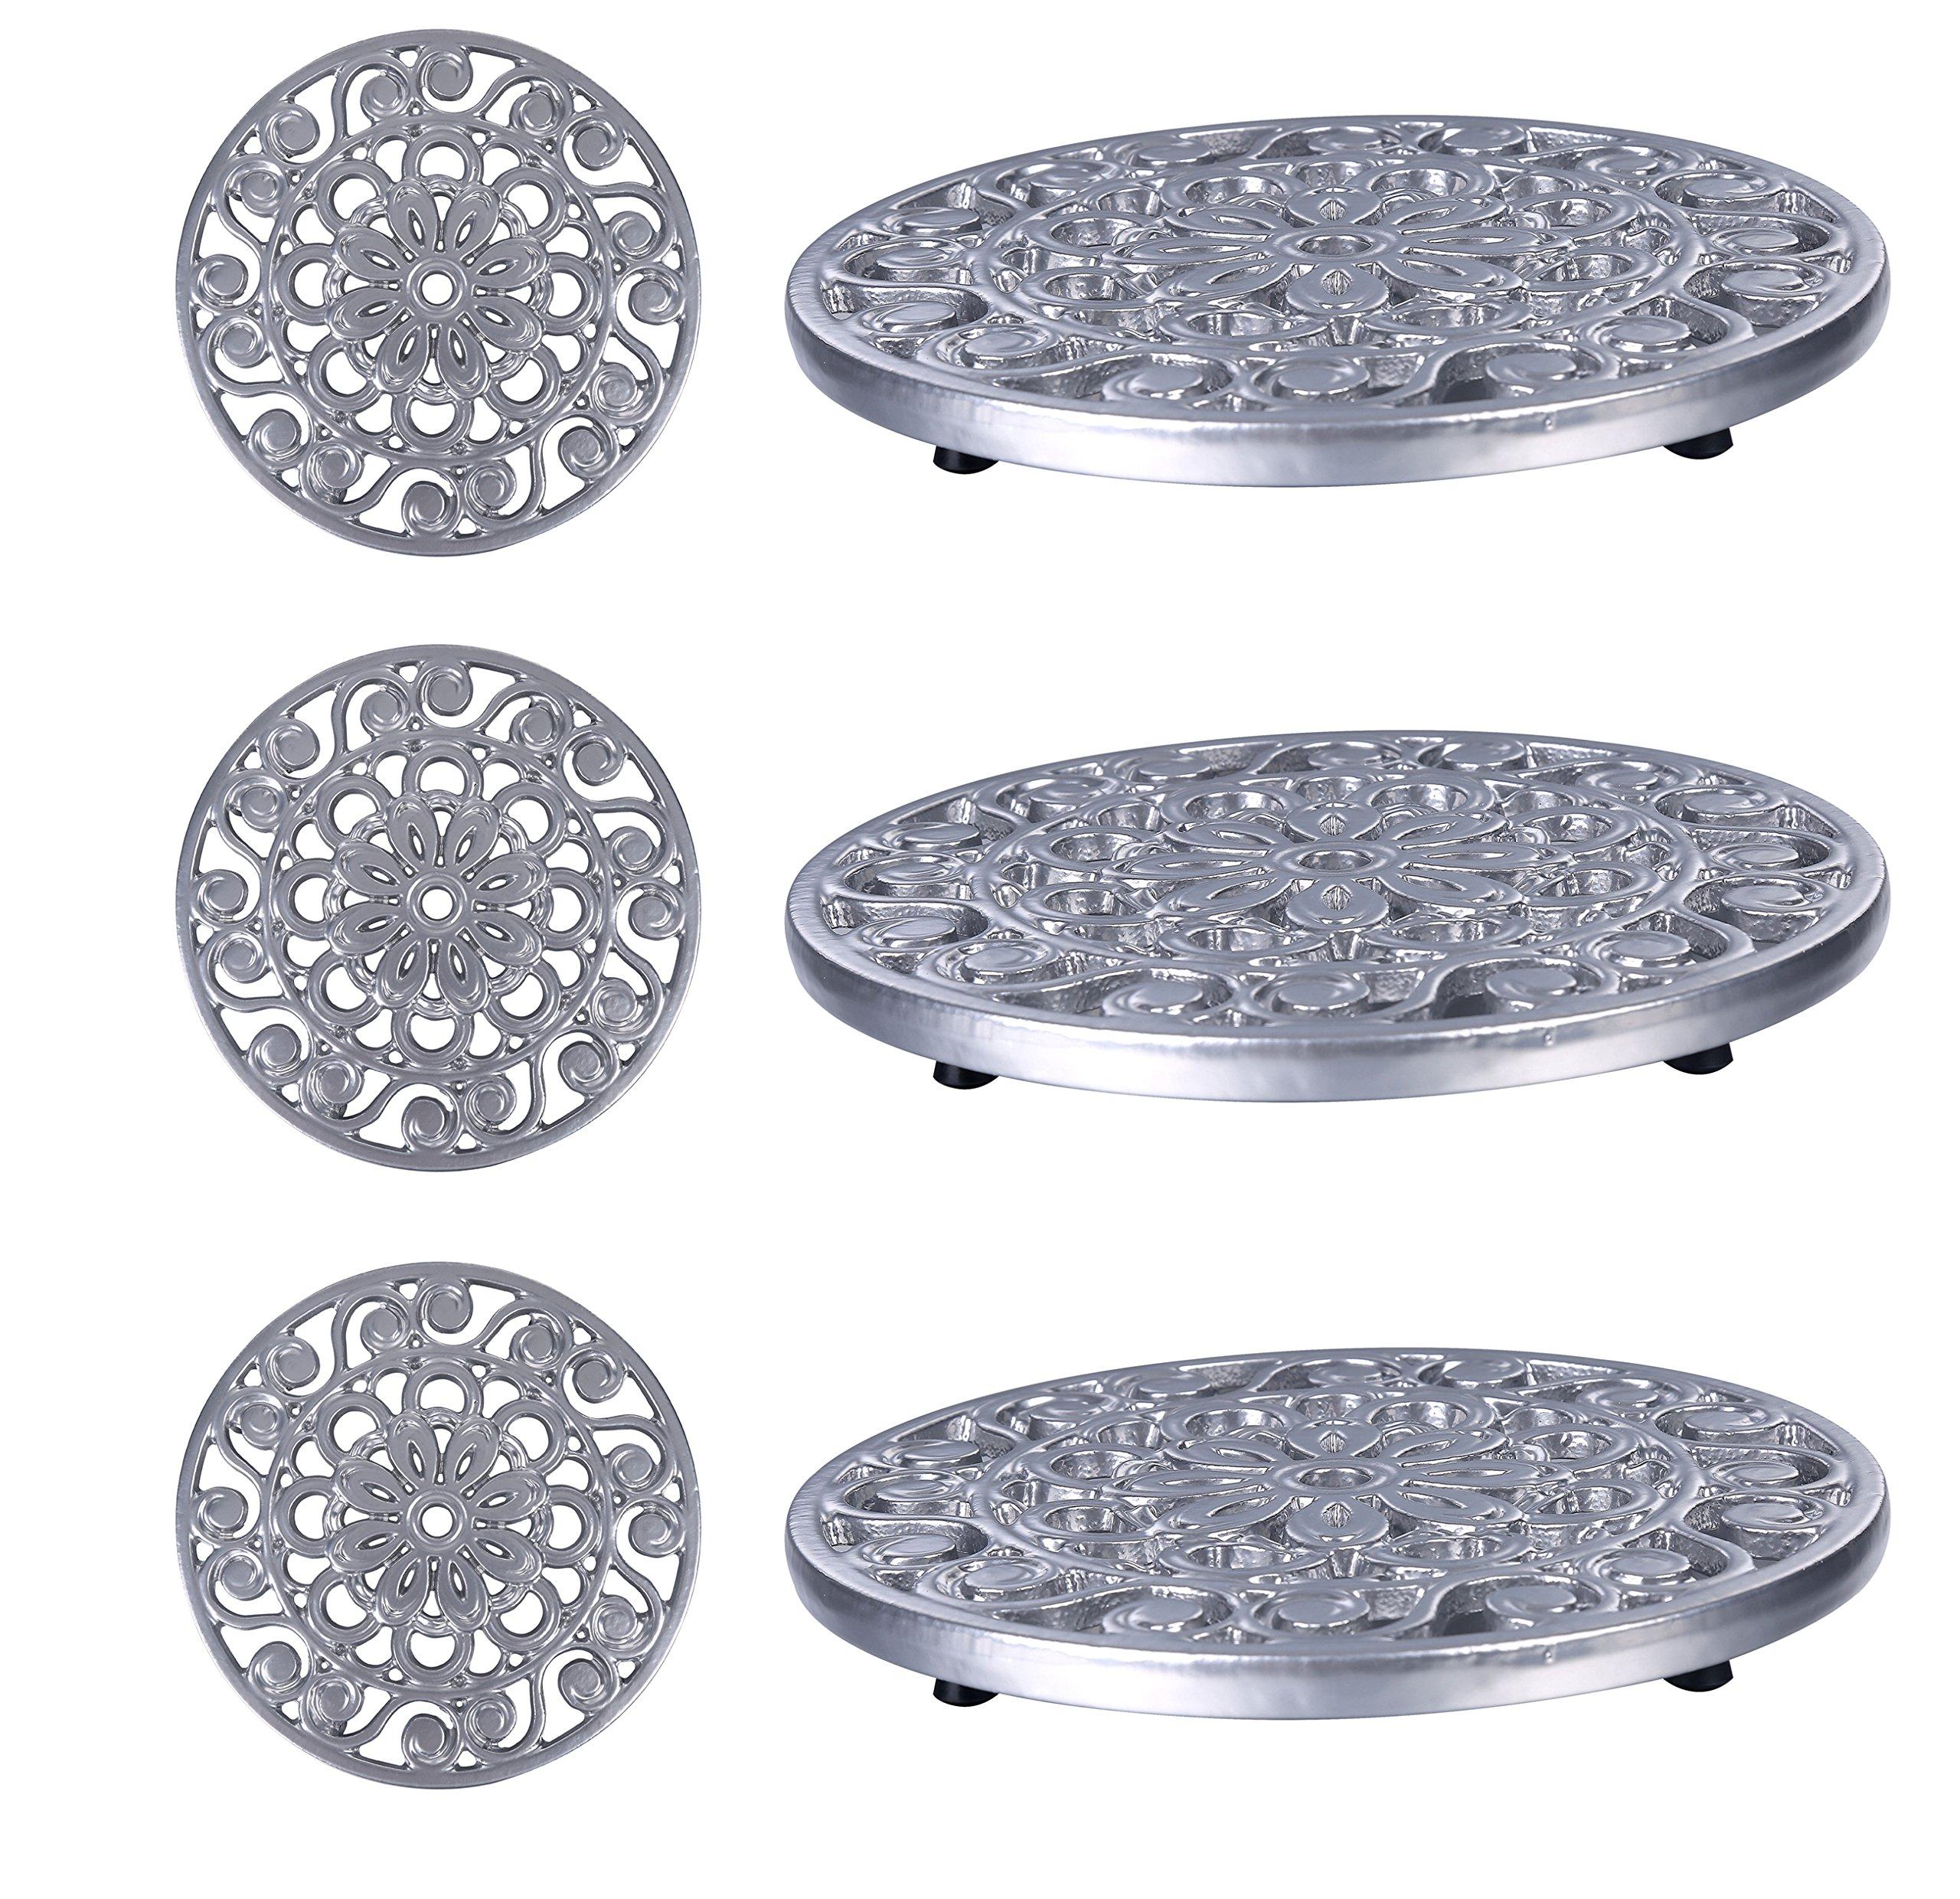 Trademark Innovations Set of 3 Decorative Cast Iron Metal Trivets - (Silver)